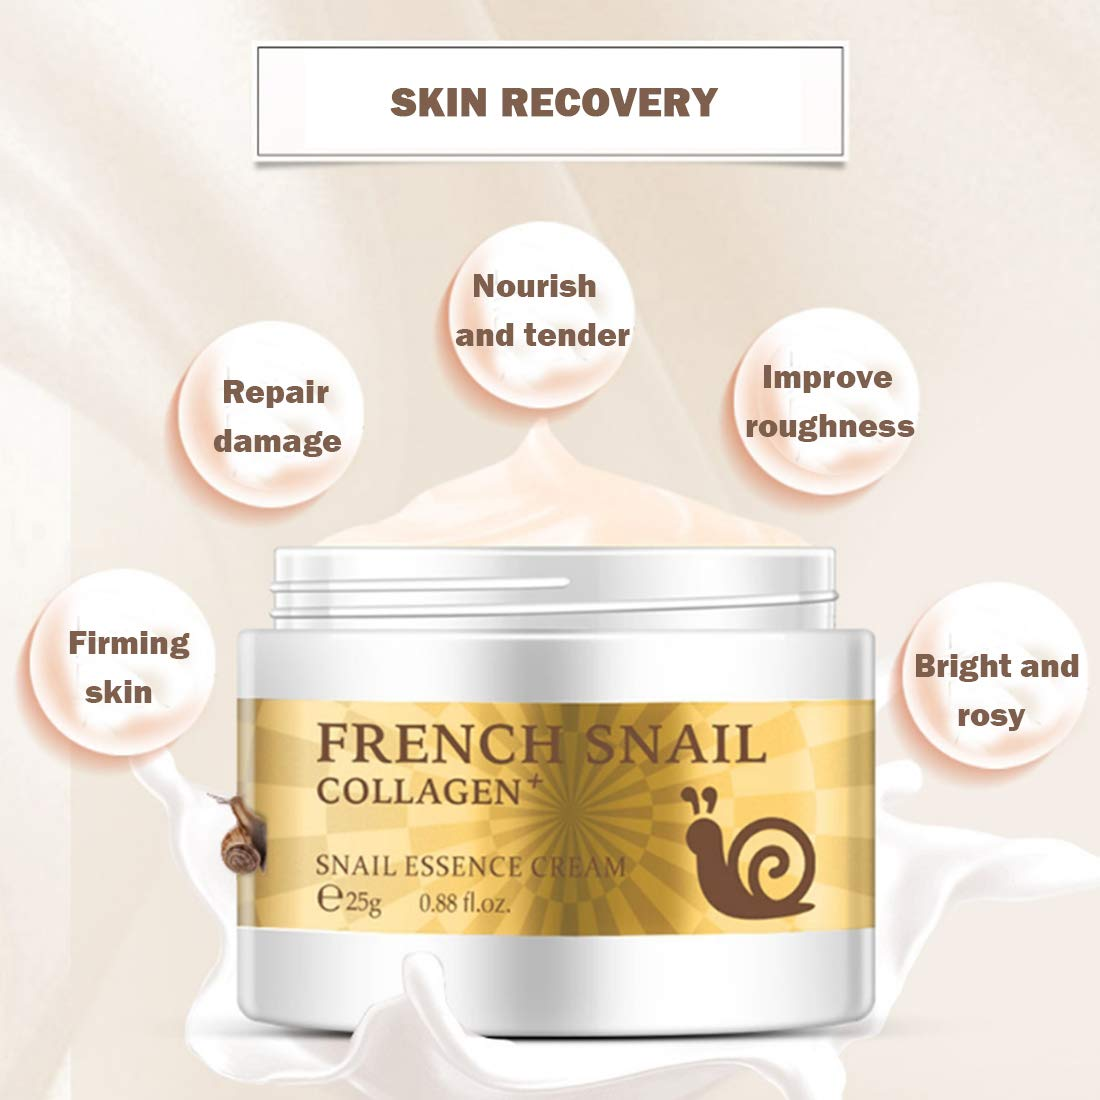 Loweryeah Snail Repair Anti-aging Cream 25g Collagen Moisturizing Nourish Repair Damaged Face Care Hyaluronic Acid Cream by Loweryeah (Image #3)